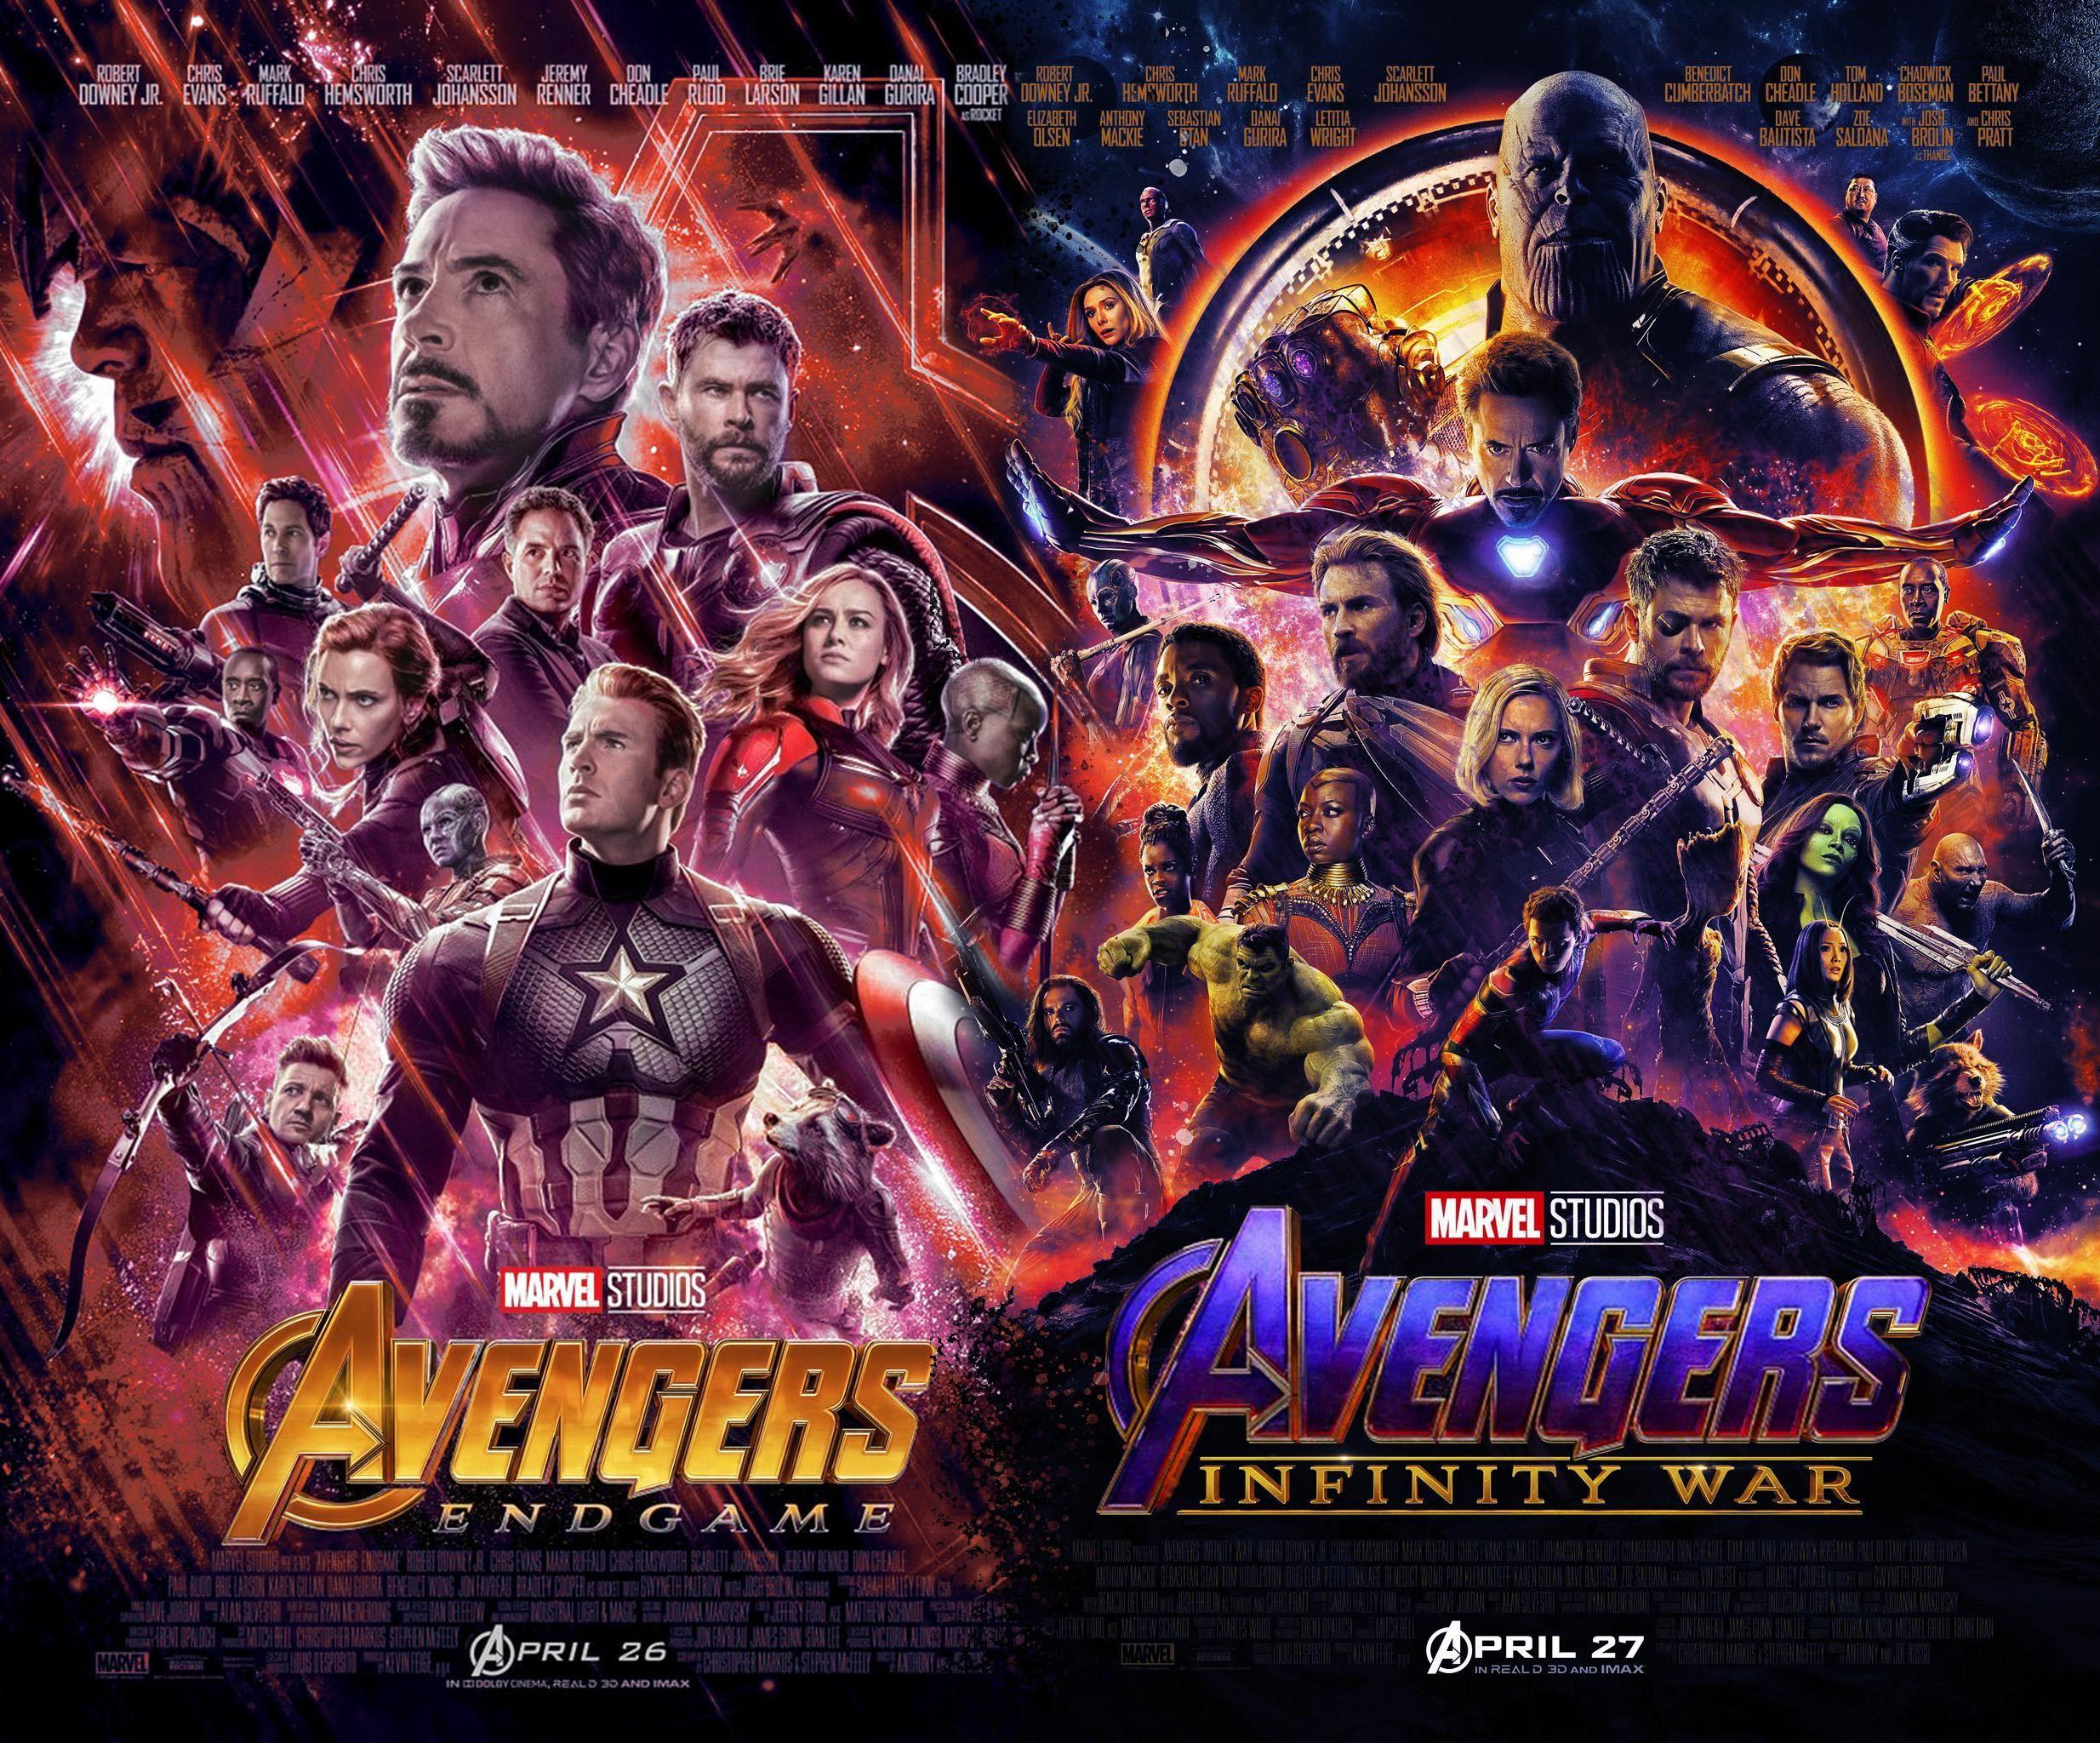 Chris Hemsworth Signed Thor Avengers Titan Hero Series Toy Endgame Infinity War Bright In Colour Entertainment Memorabilia